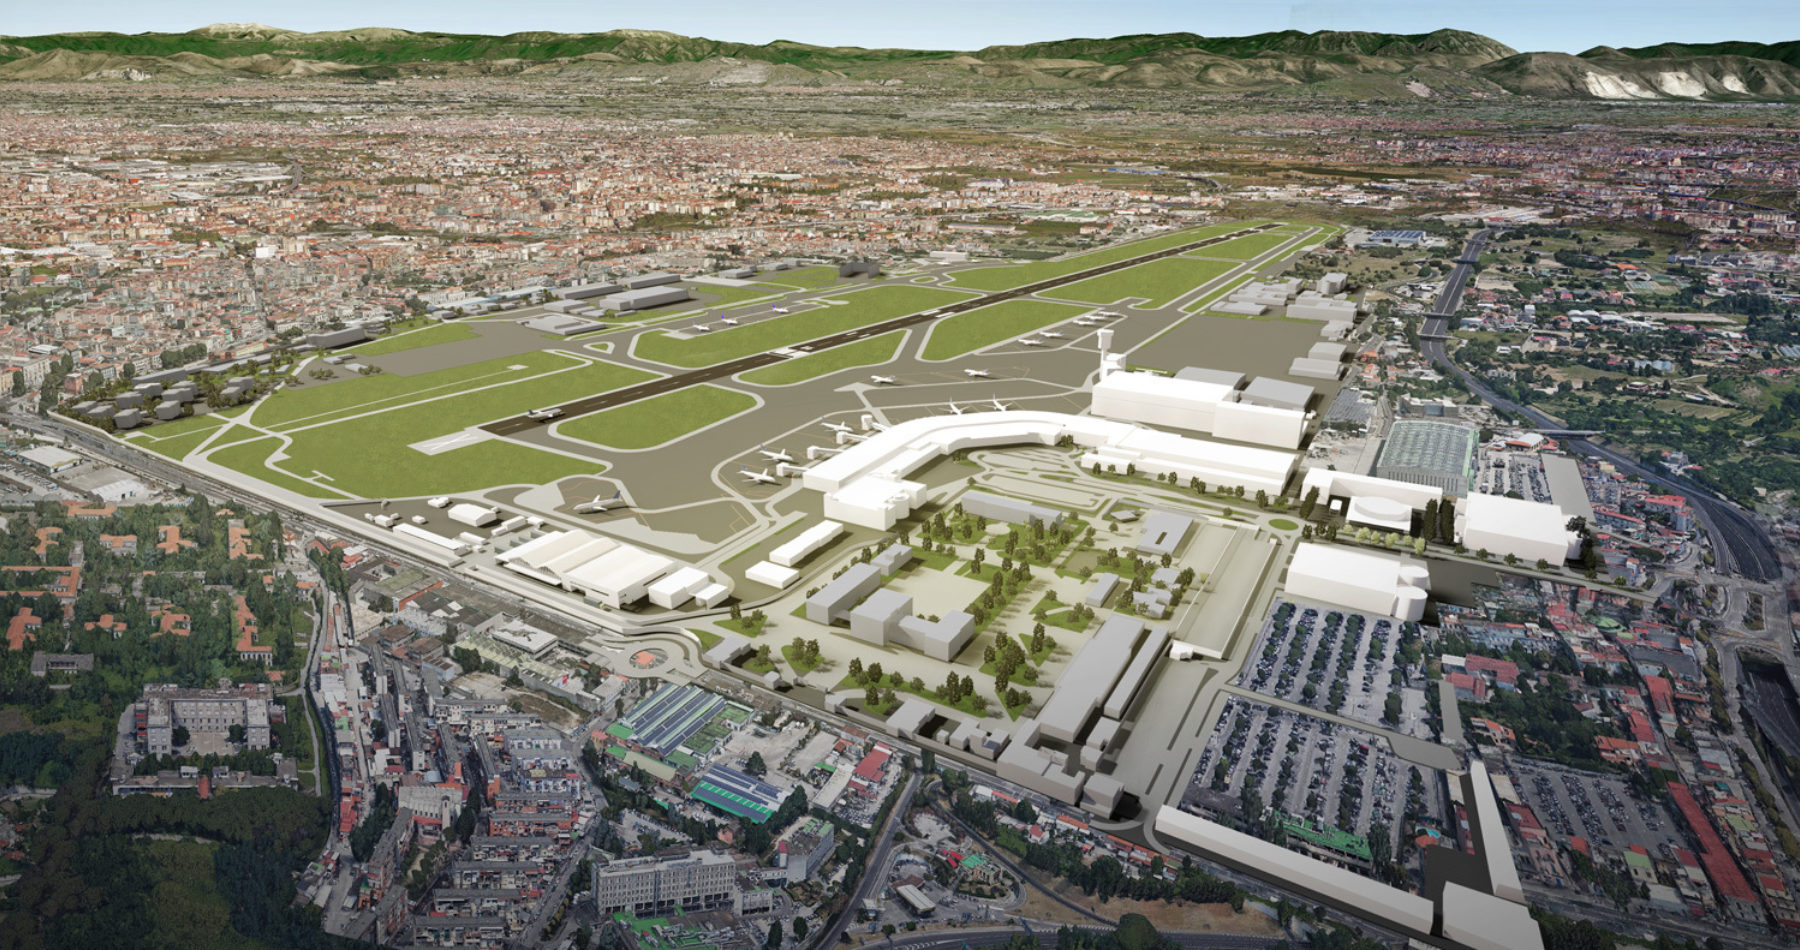 Naples International Airport (NAP) 2023 Masterplan